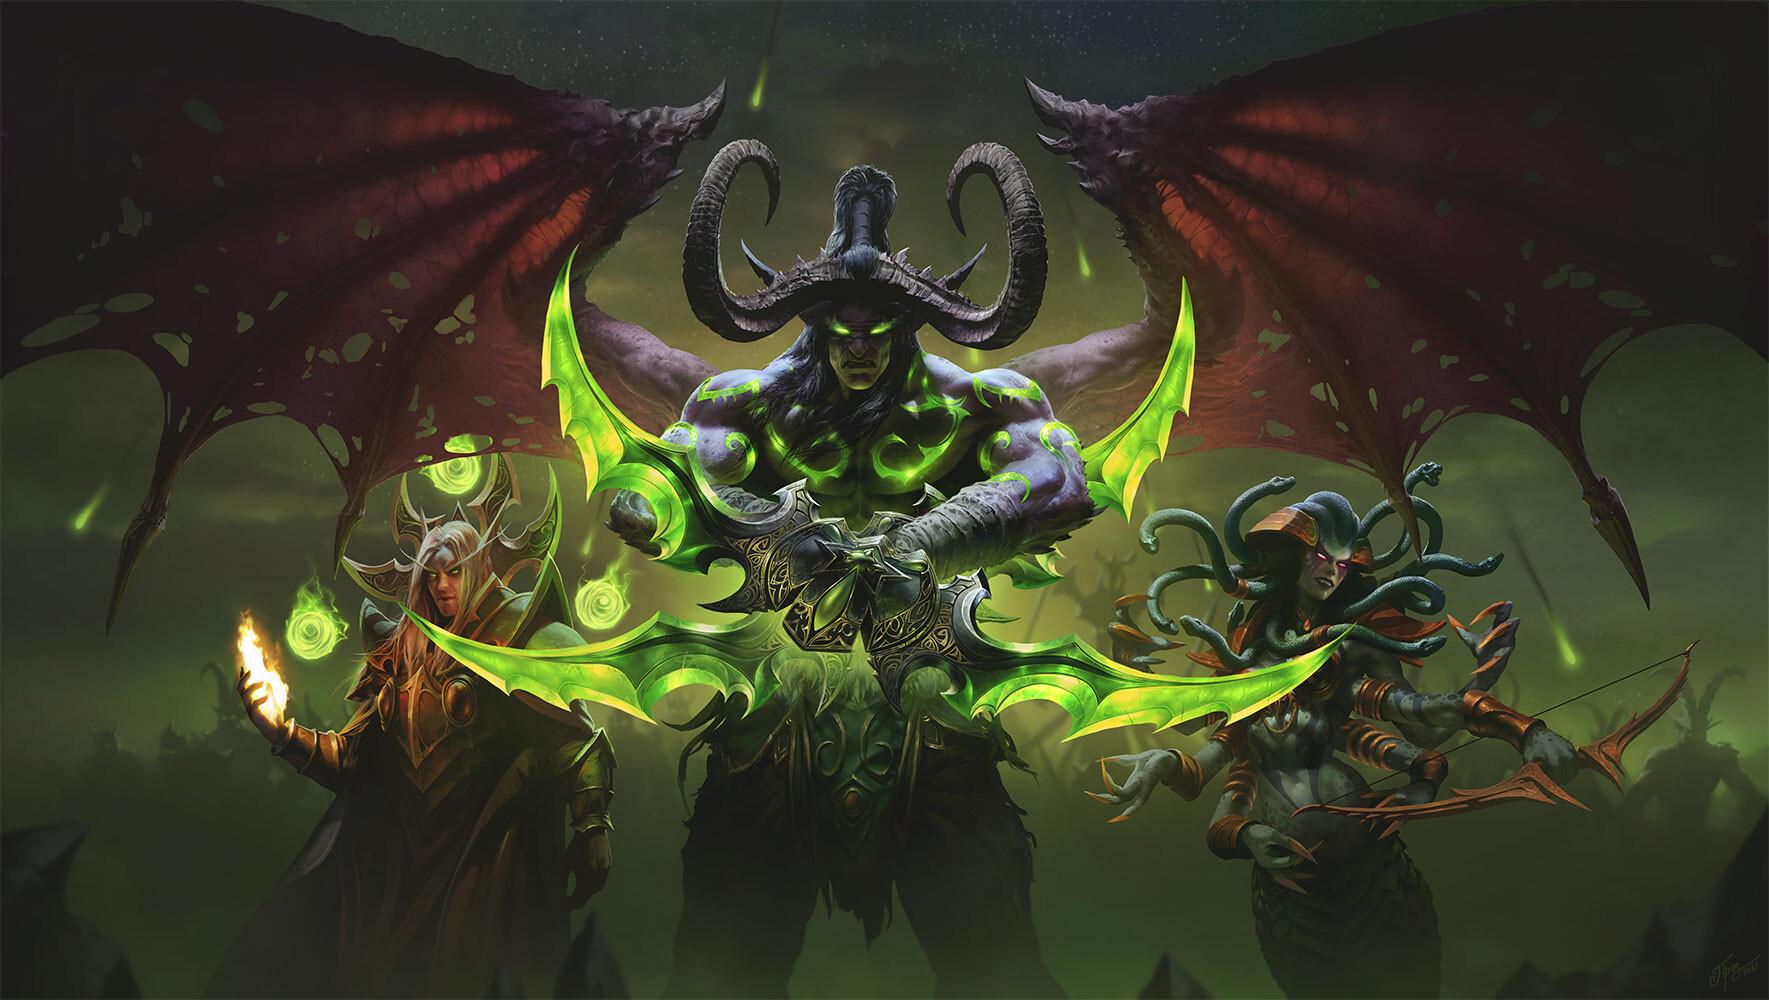 Regresa a Terrallende el 1 de junio con World of Warcraft: Burning Crusade Classic